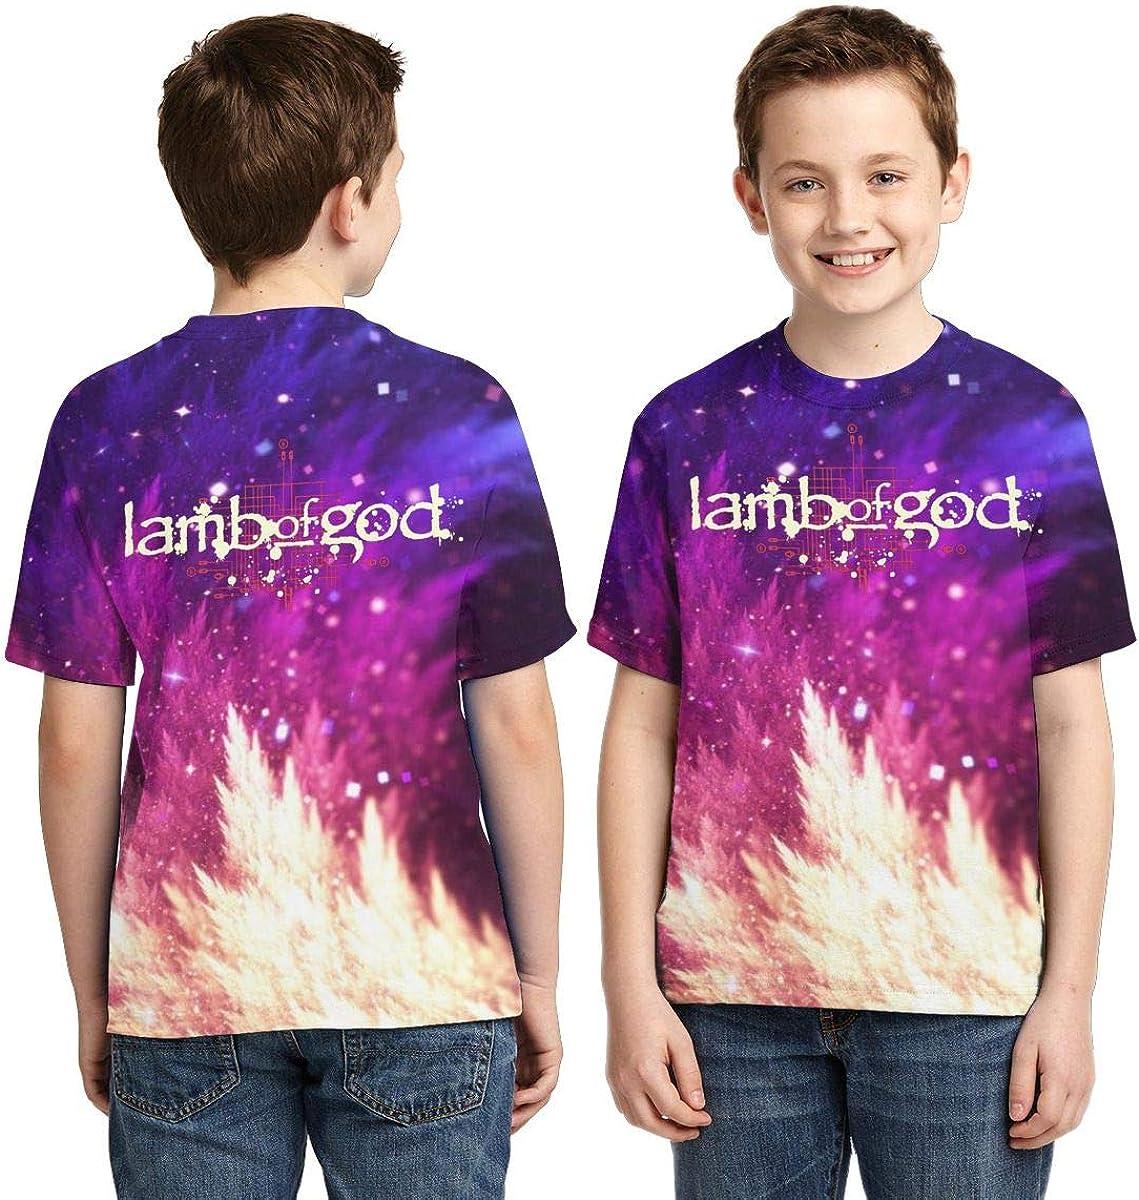 Caiyuzhuanmai Boys,Girls,Youth Lamb of God T Shirts